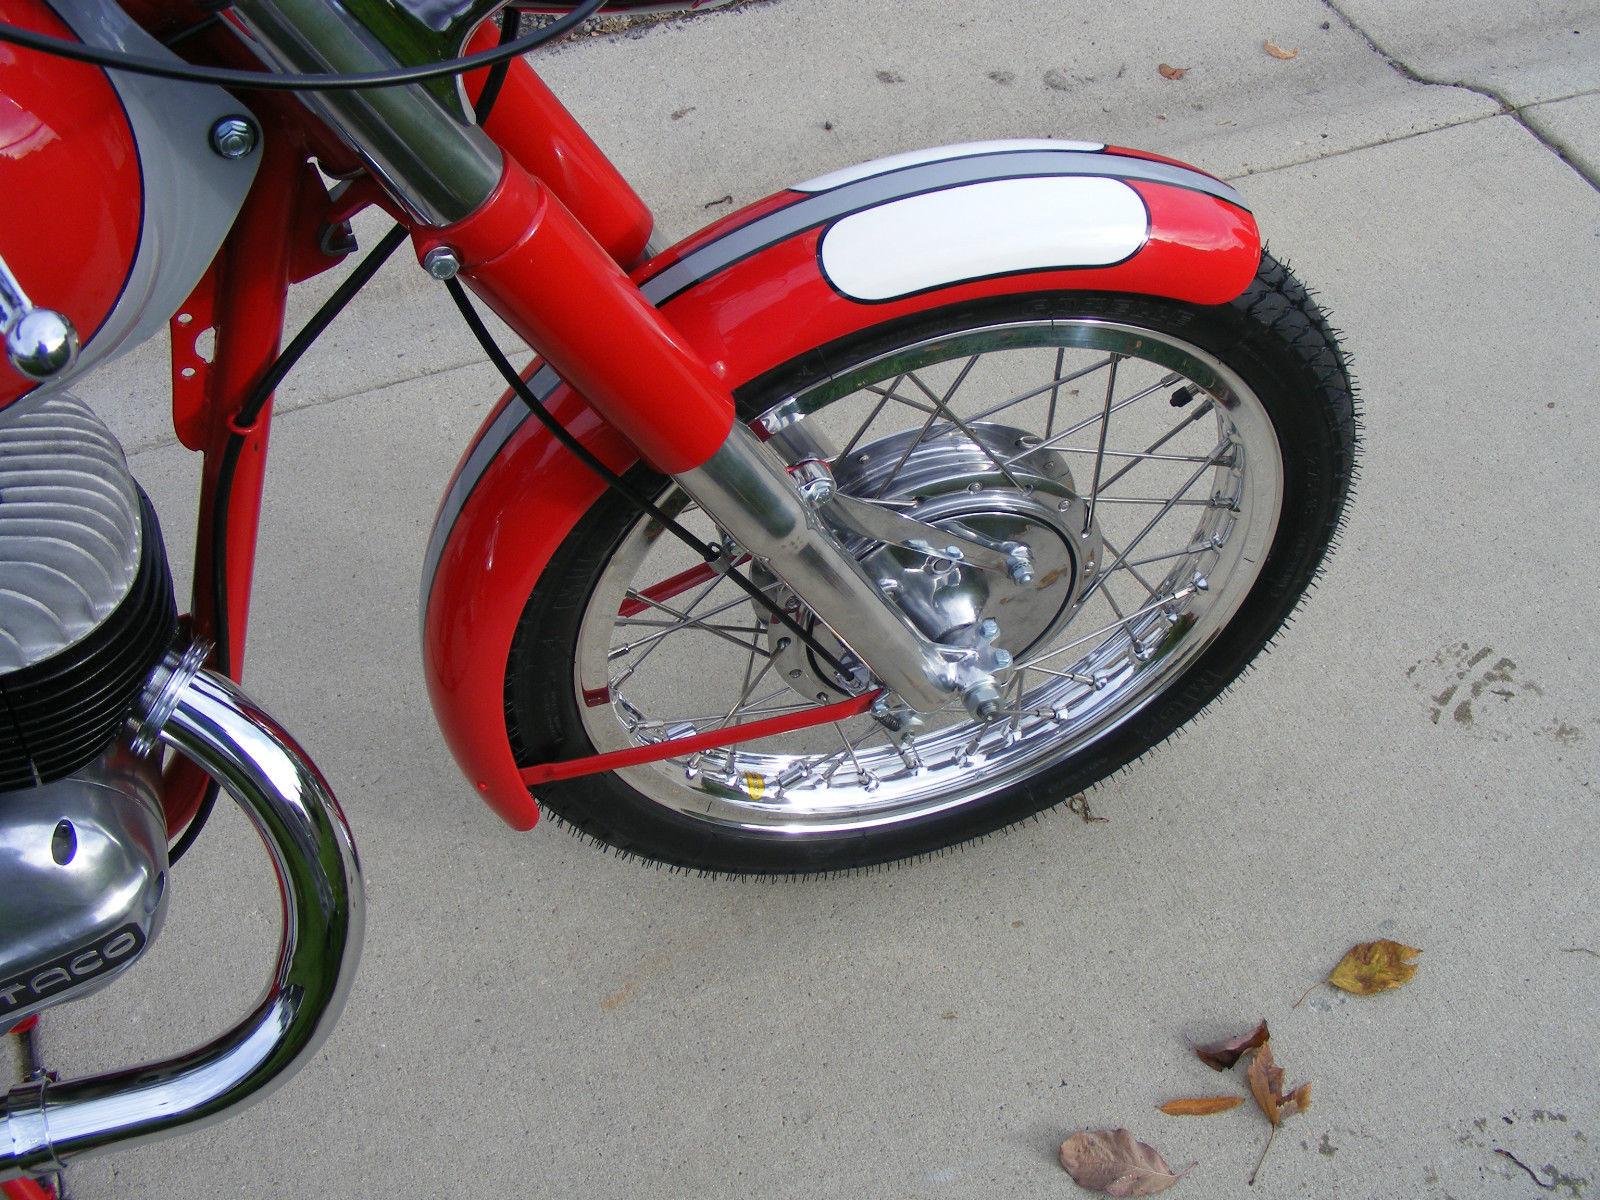 Bultaco Mercurio - 1966 - Front Wheel, Spokes, Forks and Brake Drum.